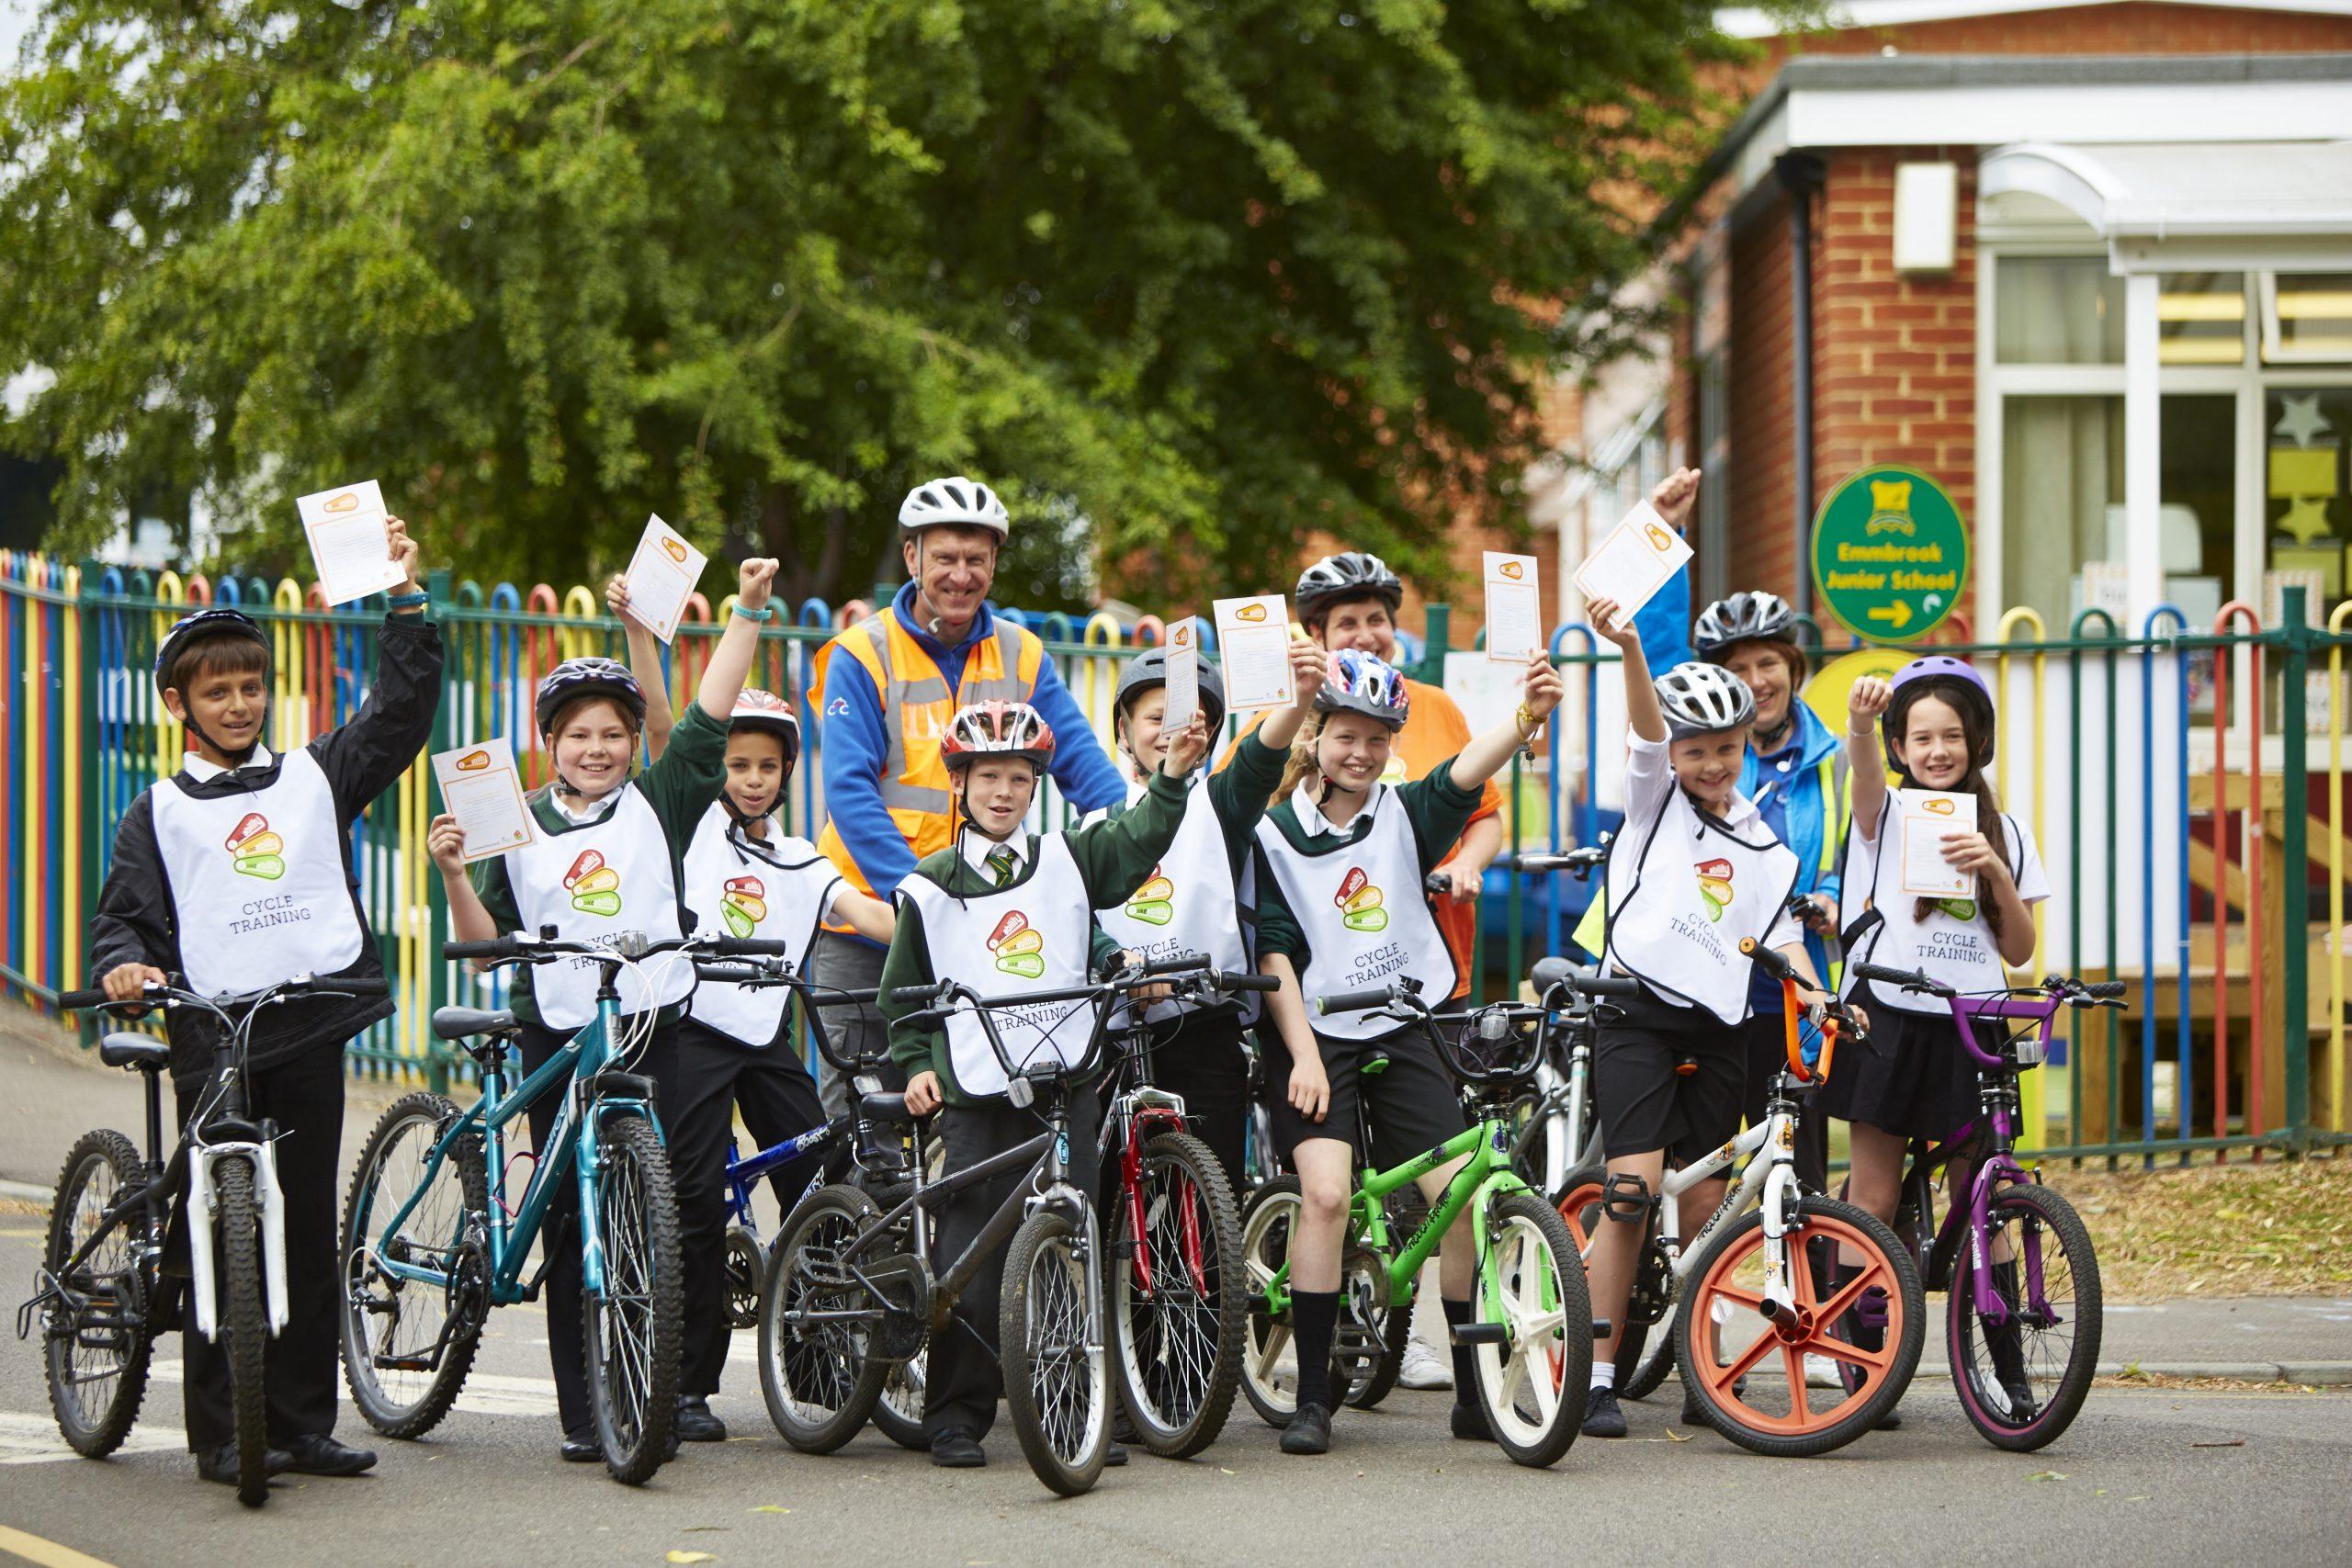 Group of school children on bikes